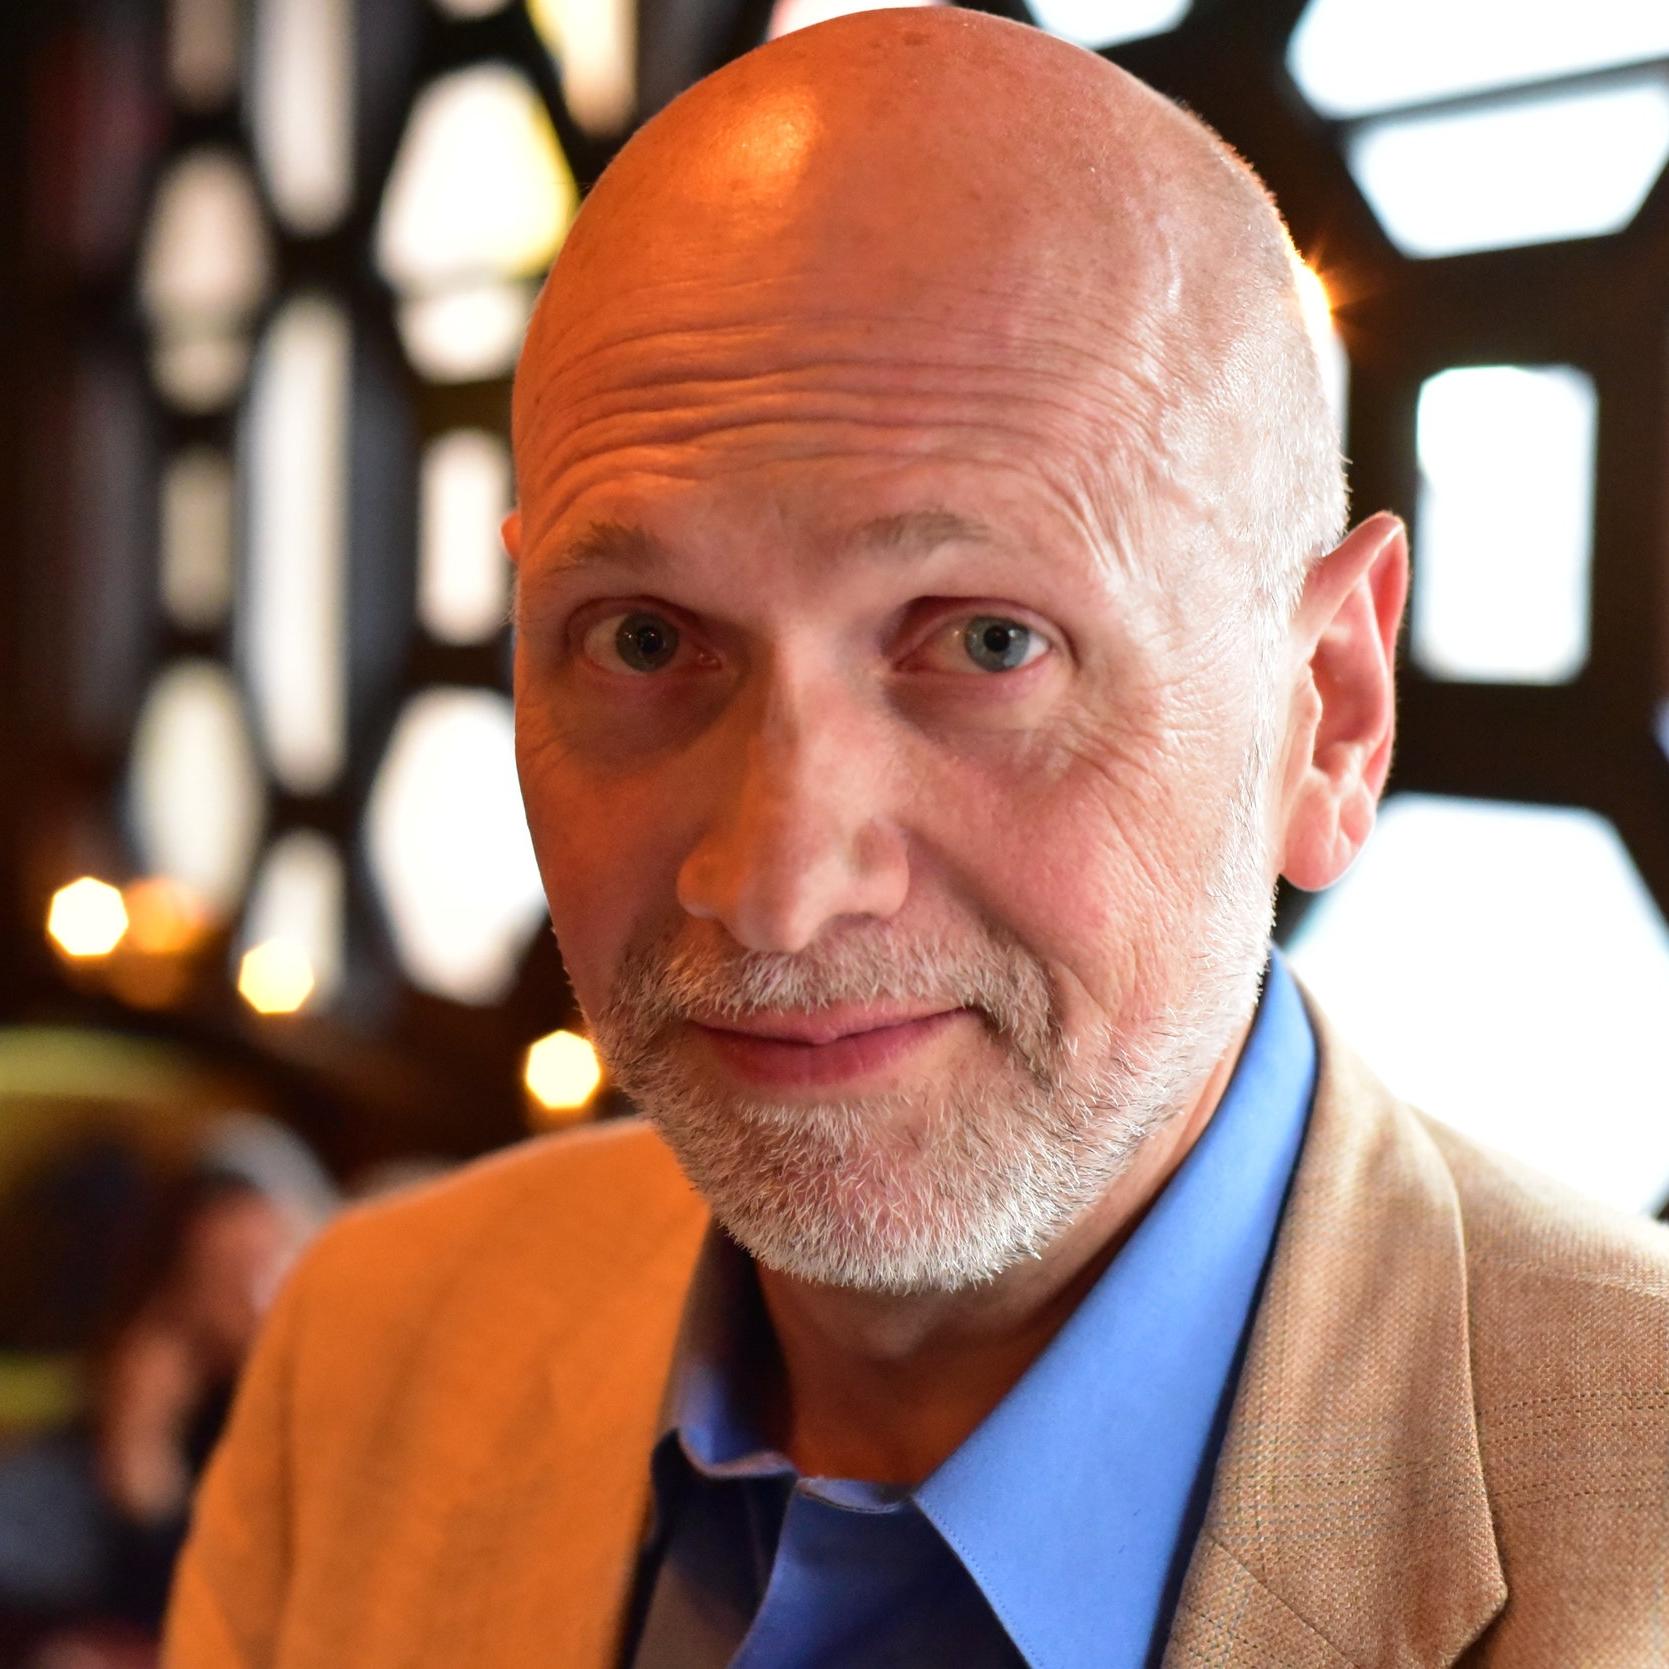 Philip Dobard headshot Spring 2017 hi-res.JPG